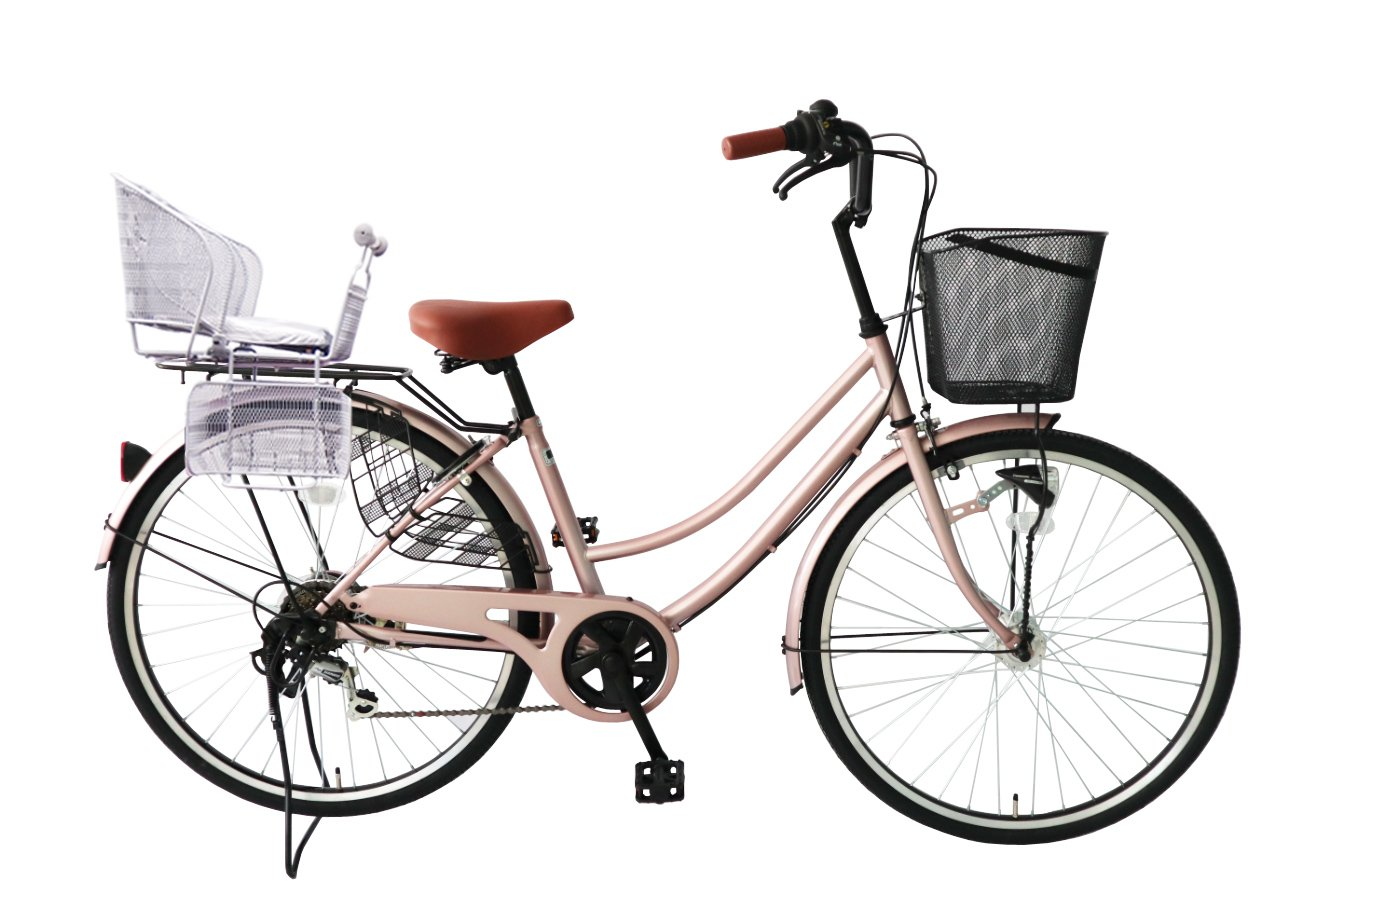 Lupinusルピナス 自転車 26インチ 未使用品 LP-266UA-KNR-S 軽快車 シマノ外装6段ギア B07CPTR8SDシャンパンピンク SALE開催中 後子乗せシルバー オートライト